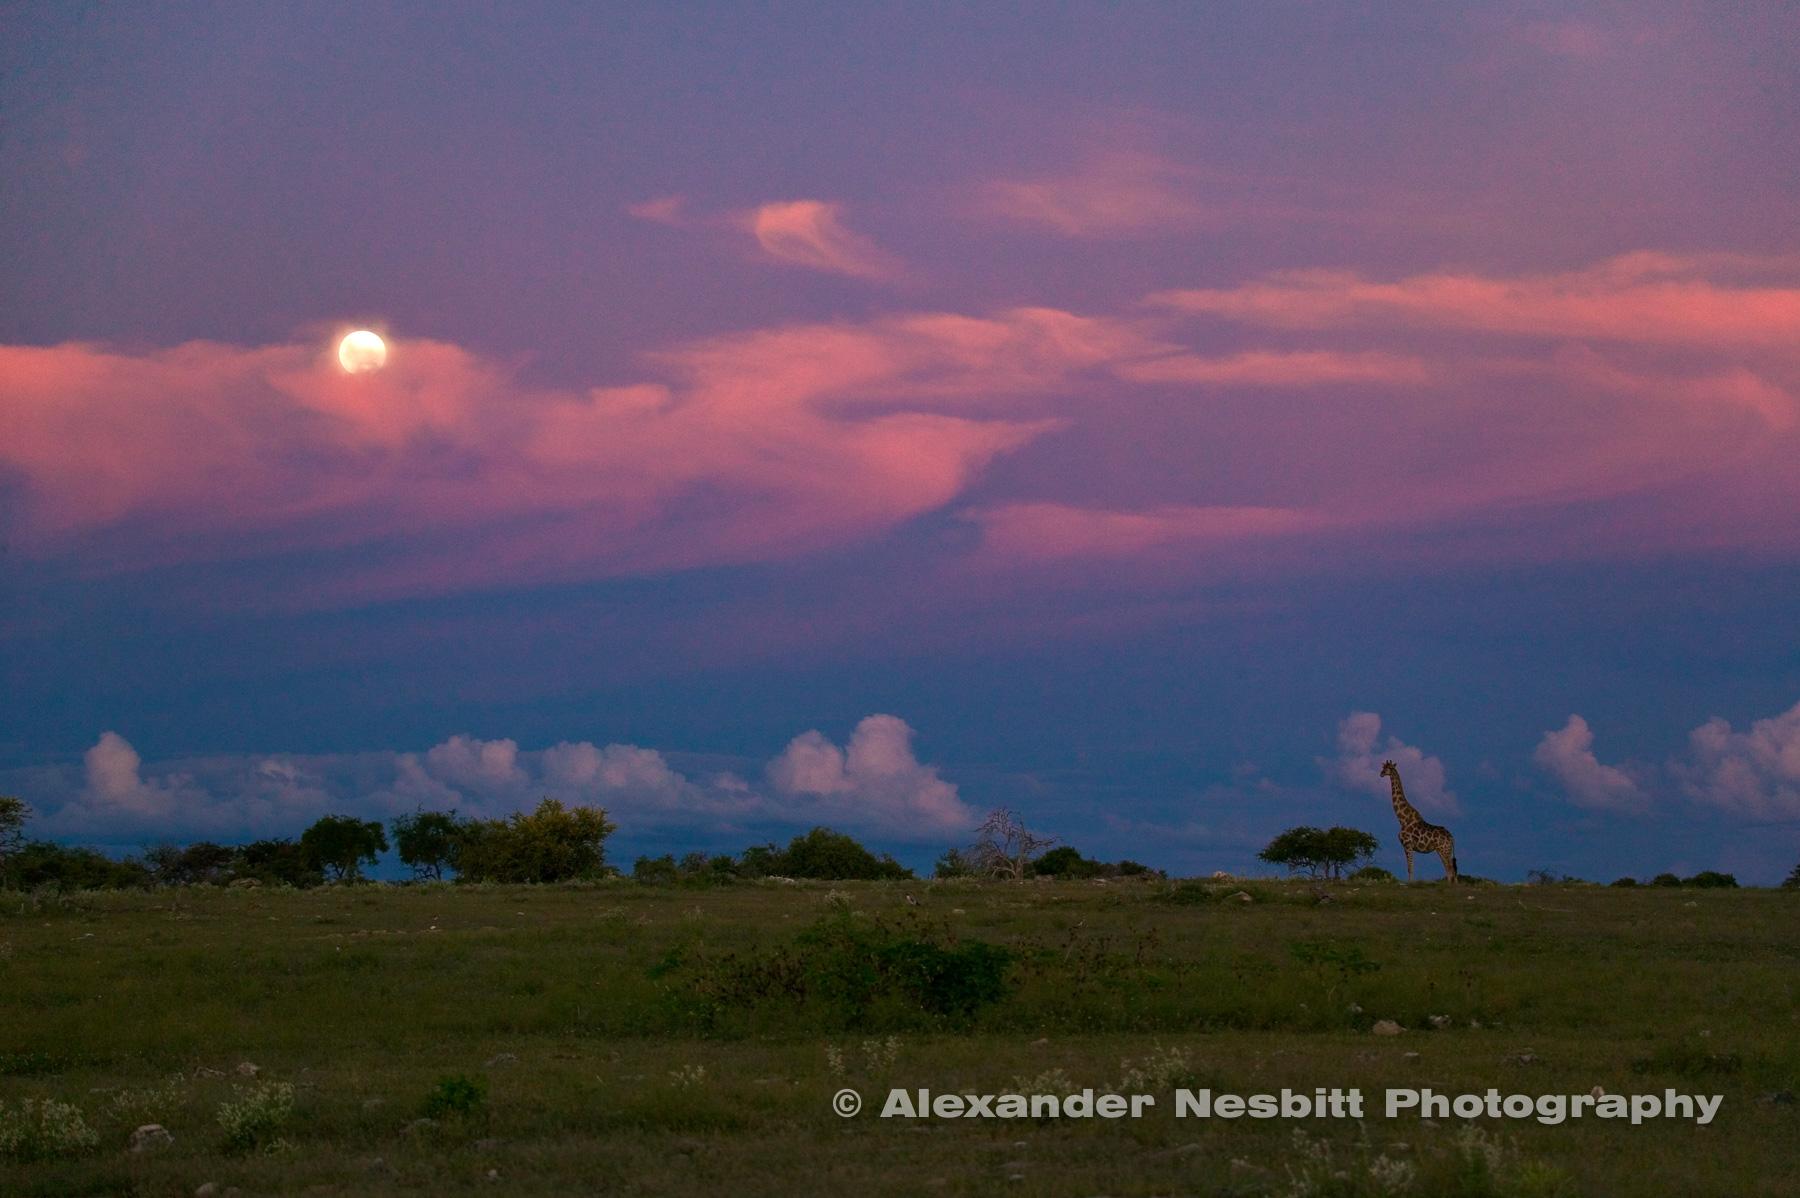 A lone Giraffe in the moon rise